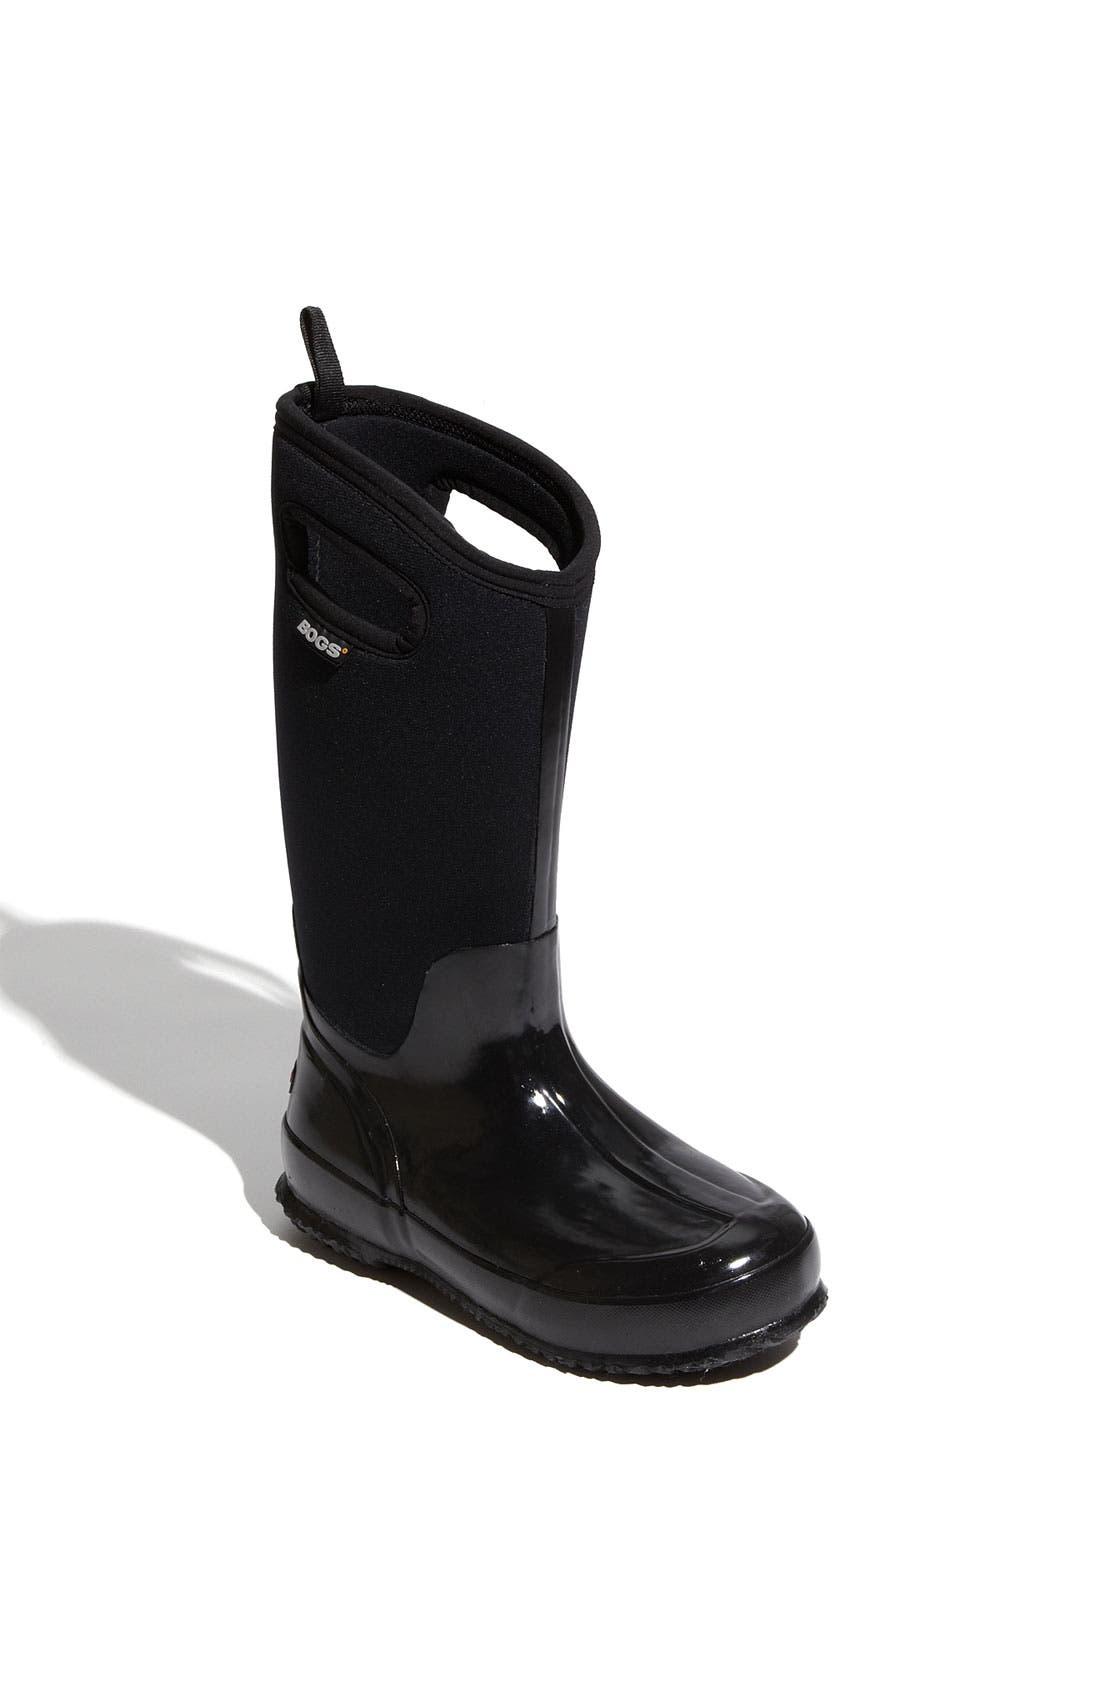 Main Image - Bogs 'Classic' Tall Rain Boot (Women)